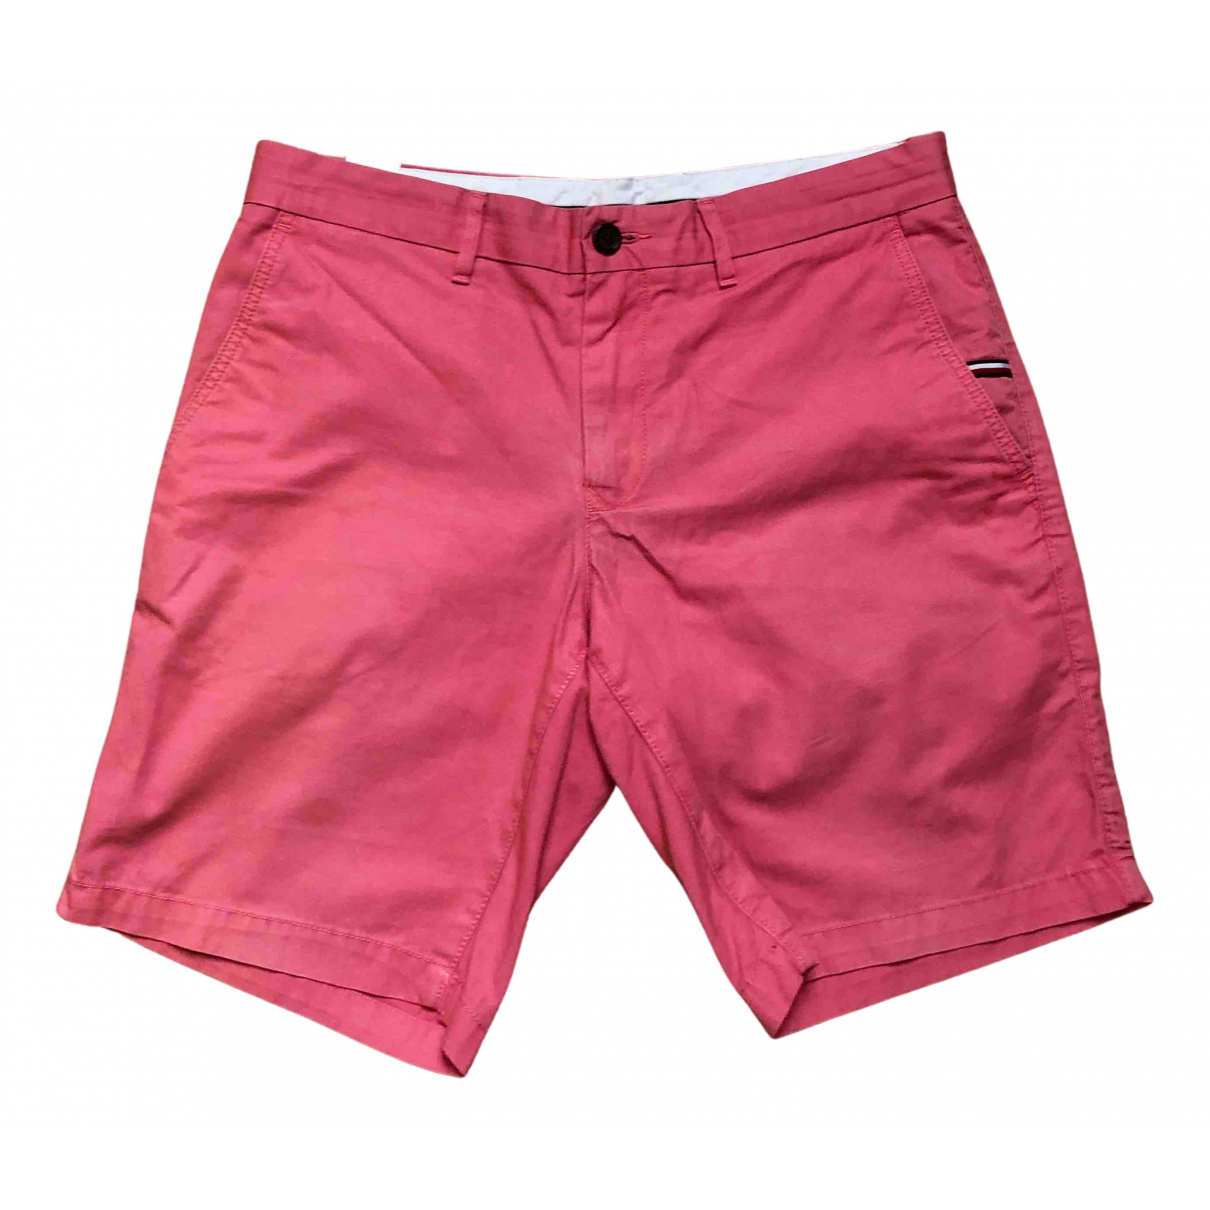 Tommy Hilfiger \N Shorts in  Rosa Baumwolle